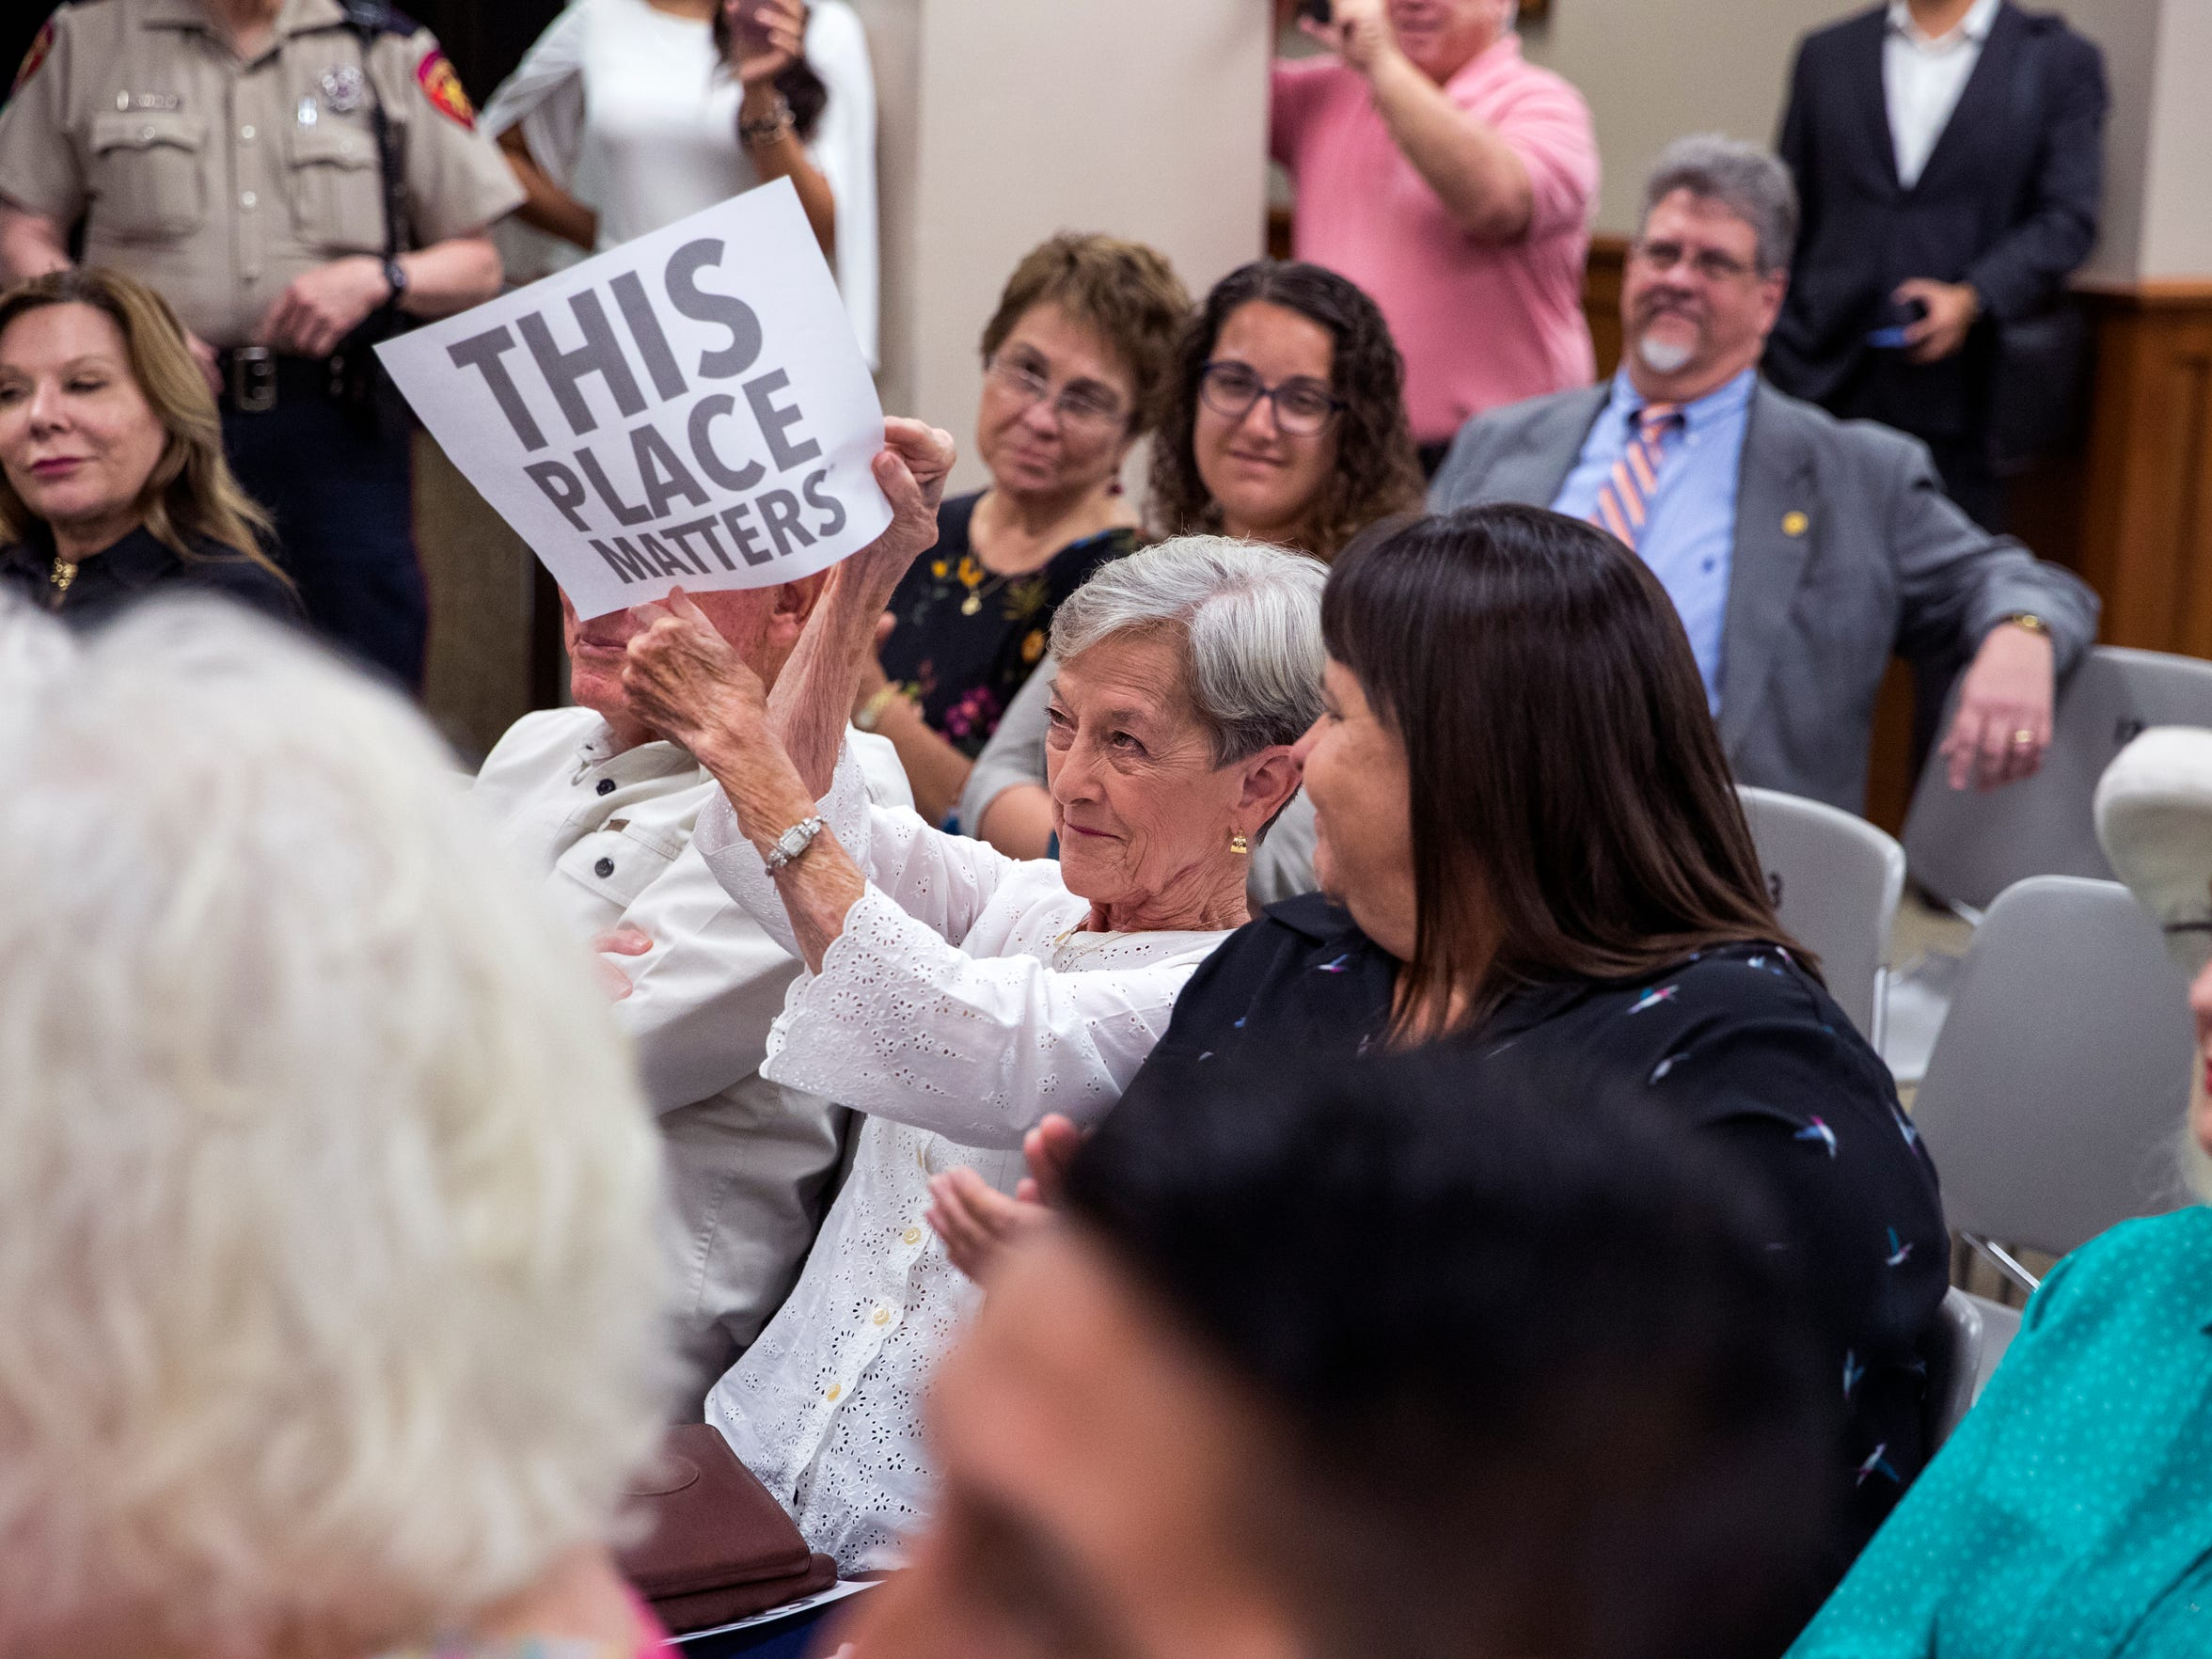 Corpus Christi resident Greer Mahaffey, 75, holds up